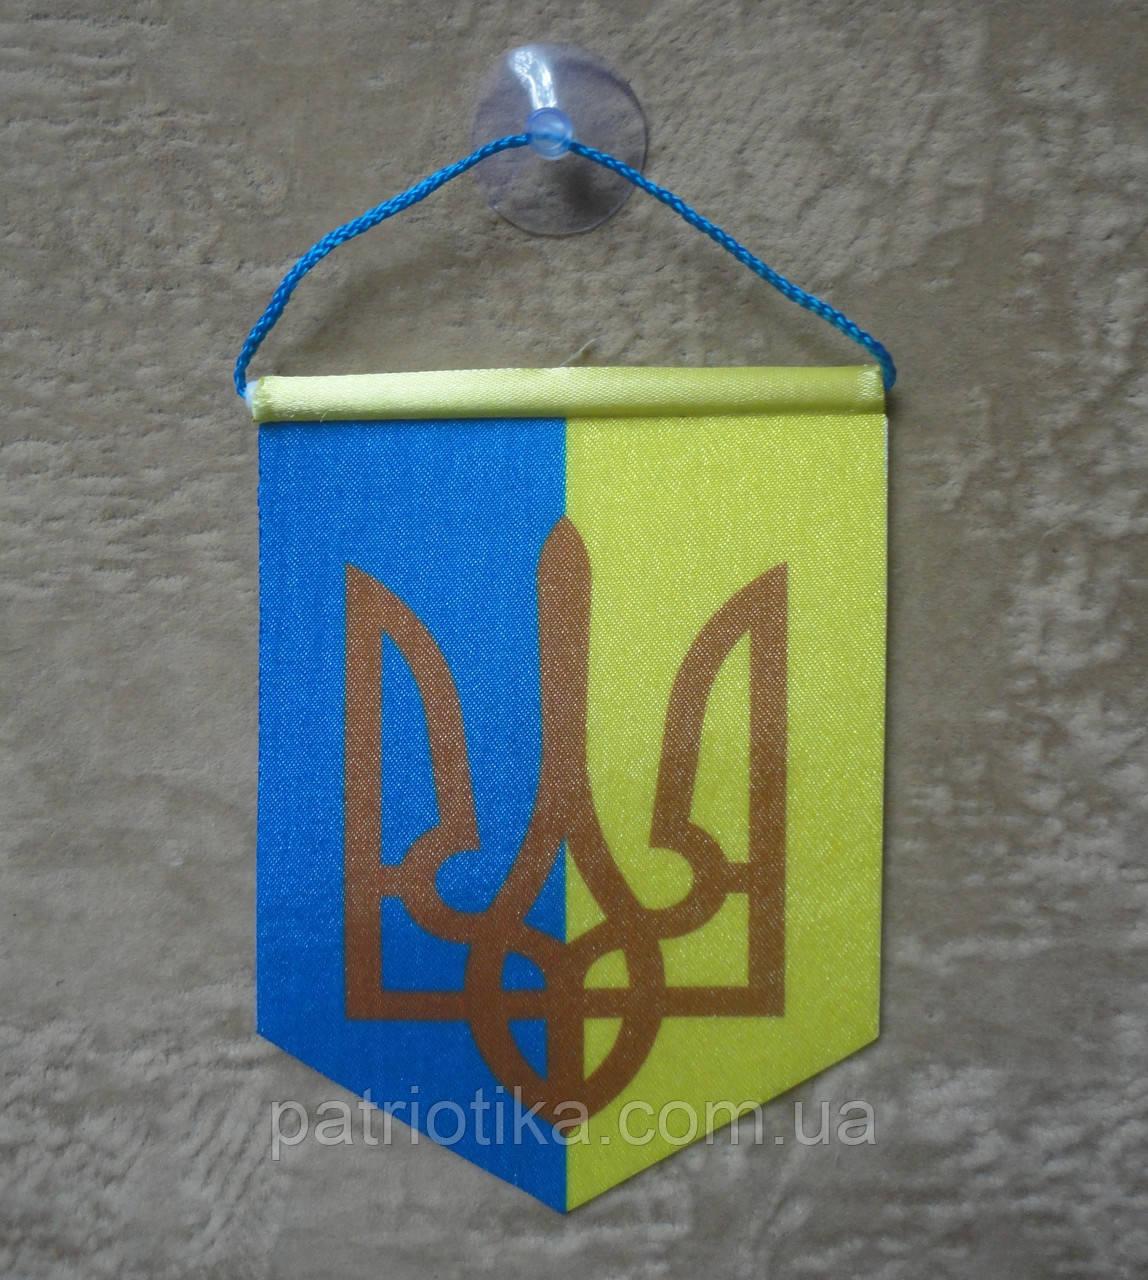 Вымпел Украины двухцветный | Вимпел України двоколірний 13х9 см